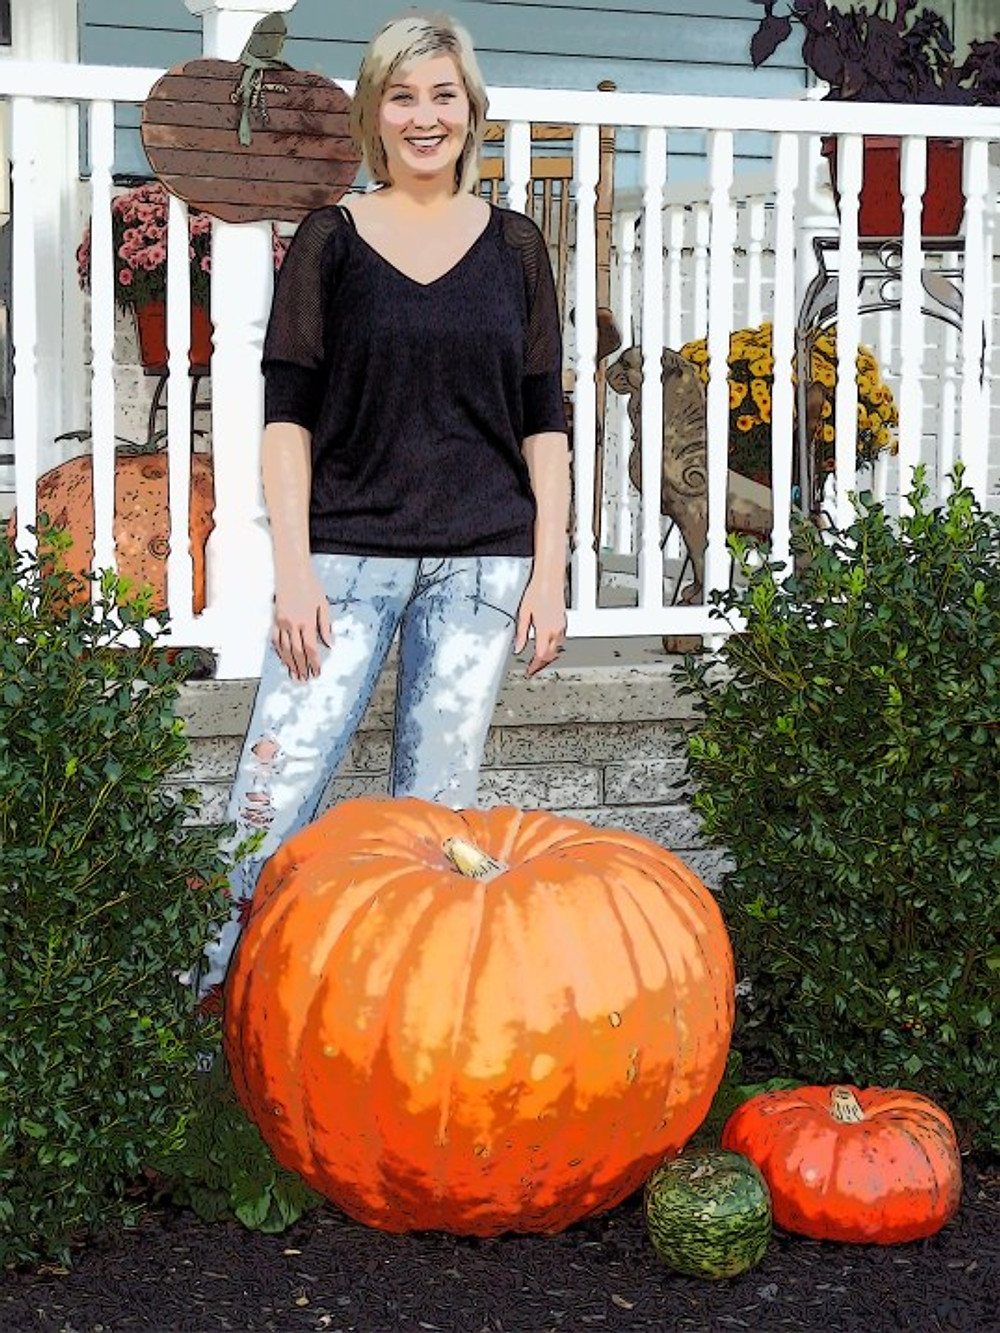 Time for Pumpkin Magick!